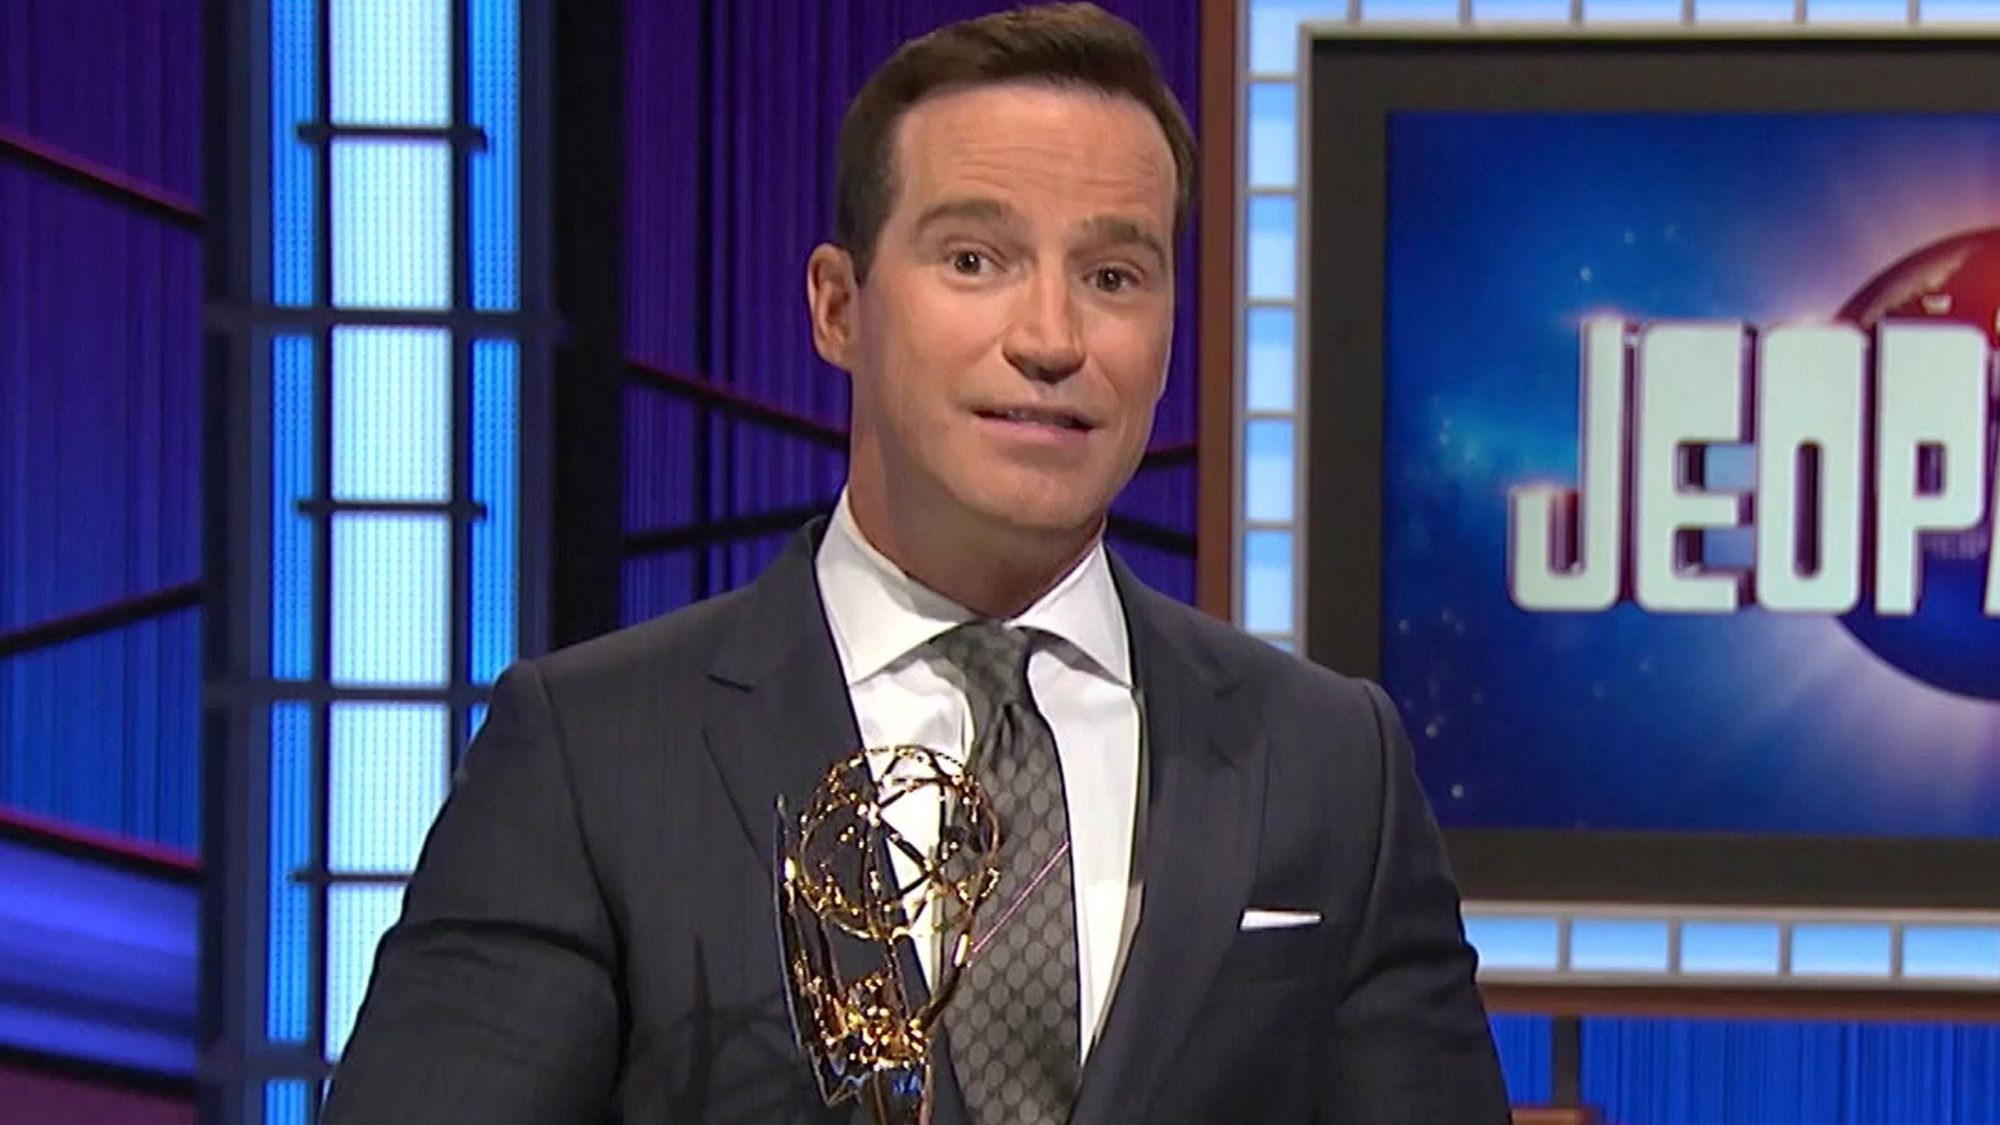 Mike Richards on Jeopardy